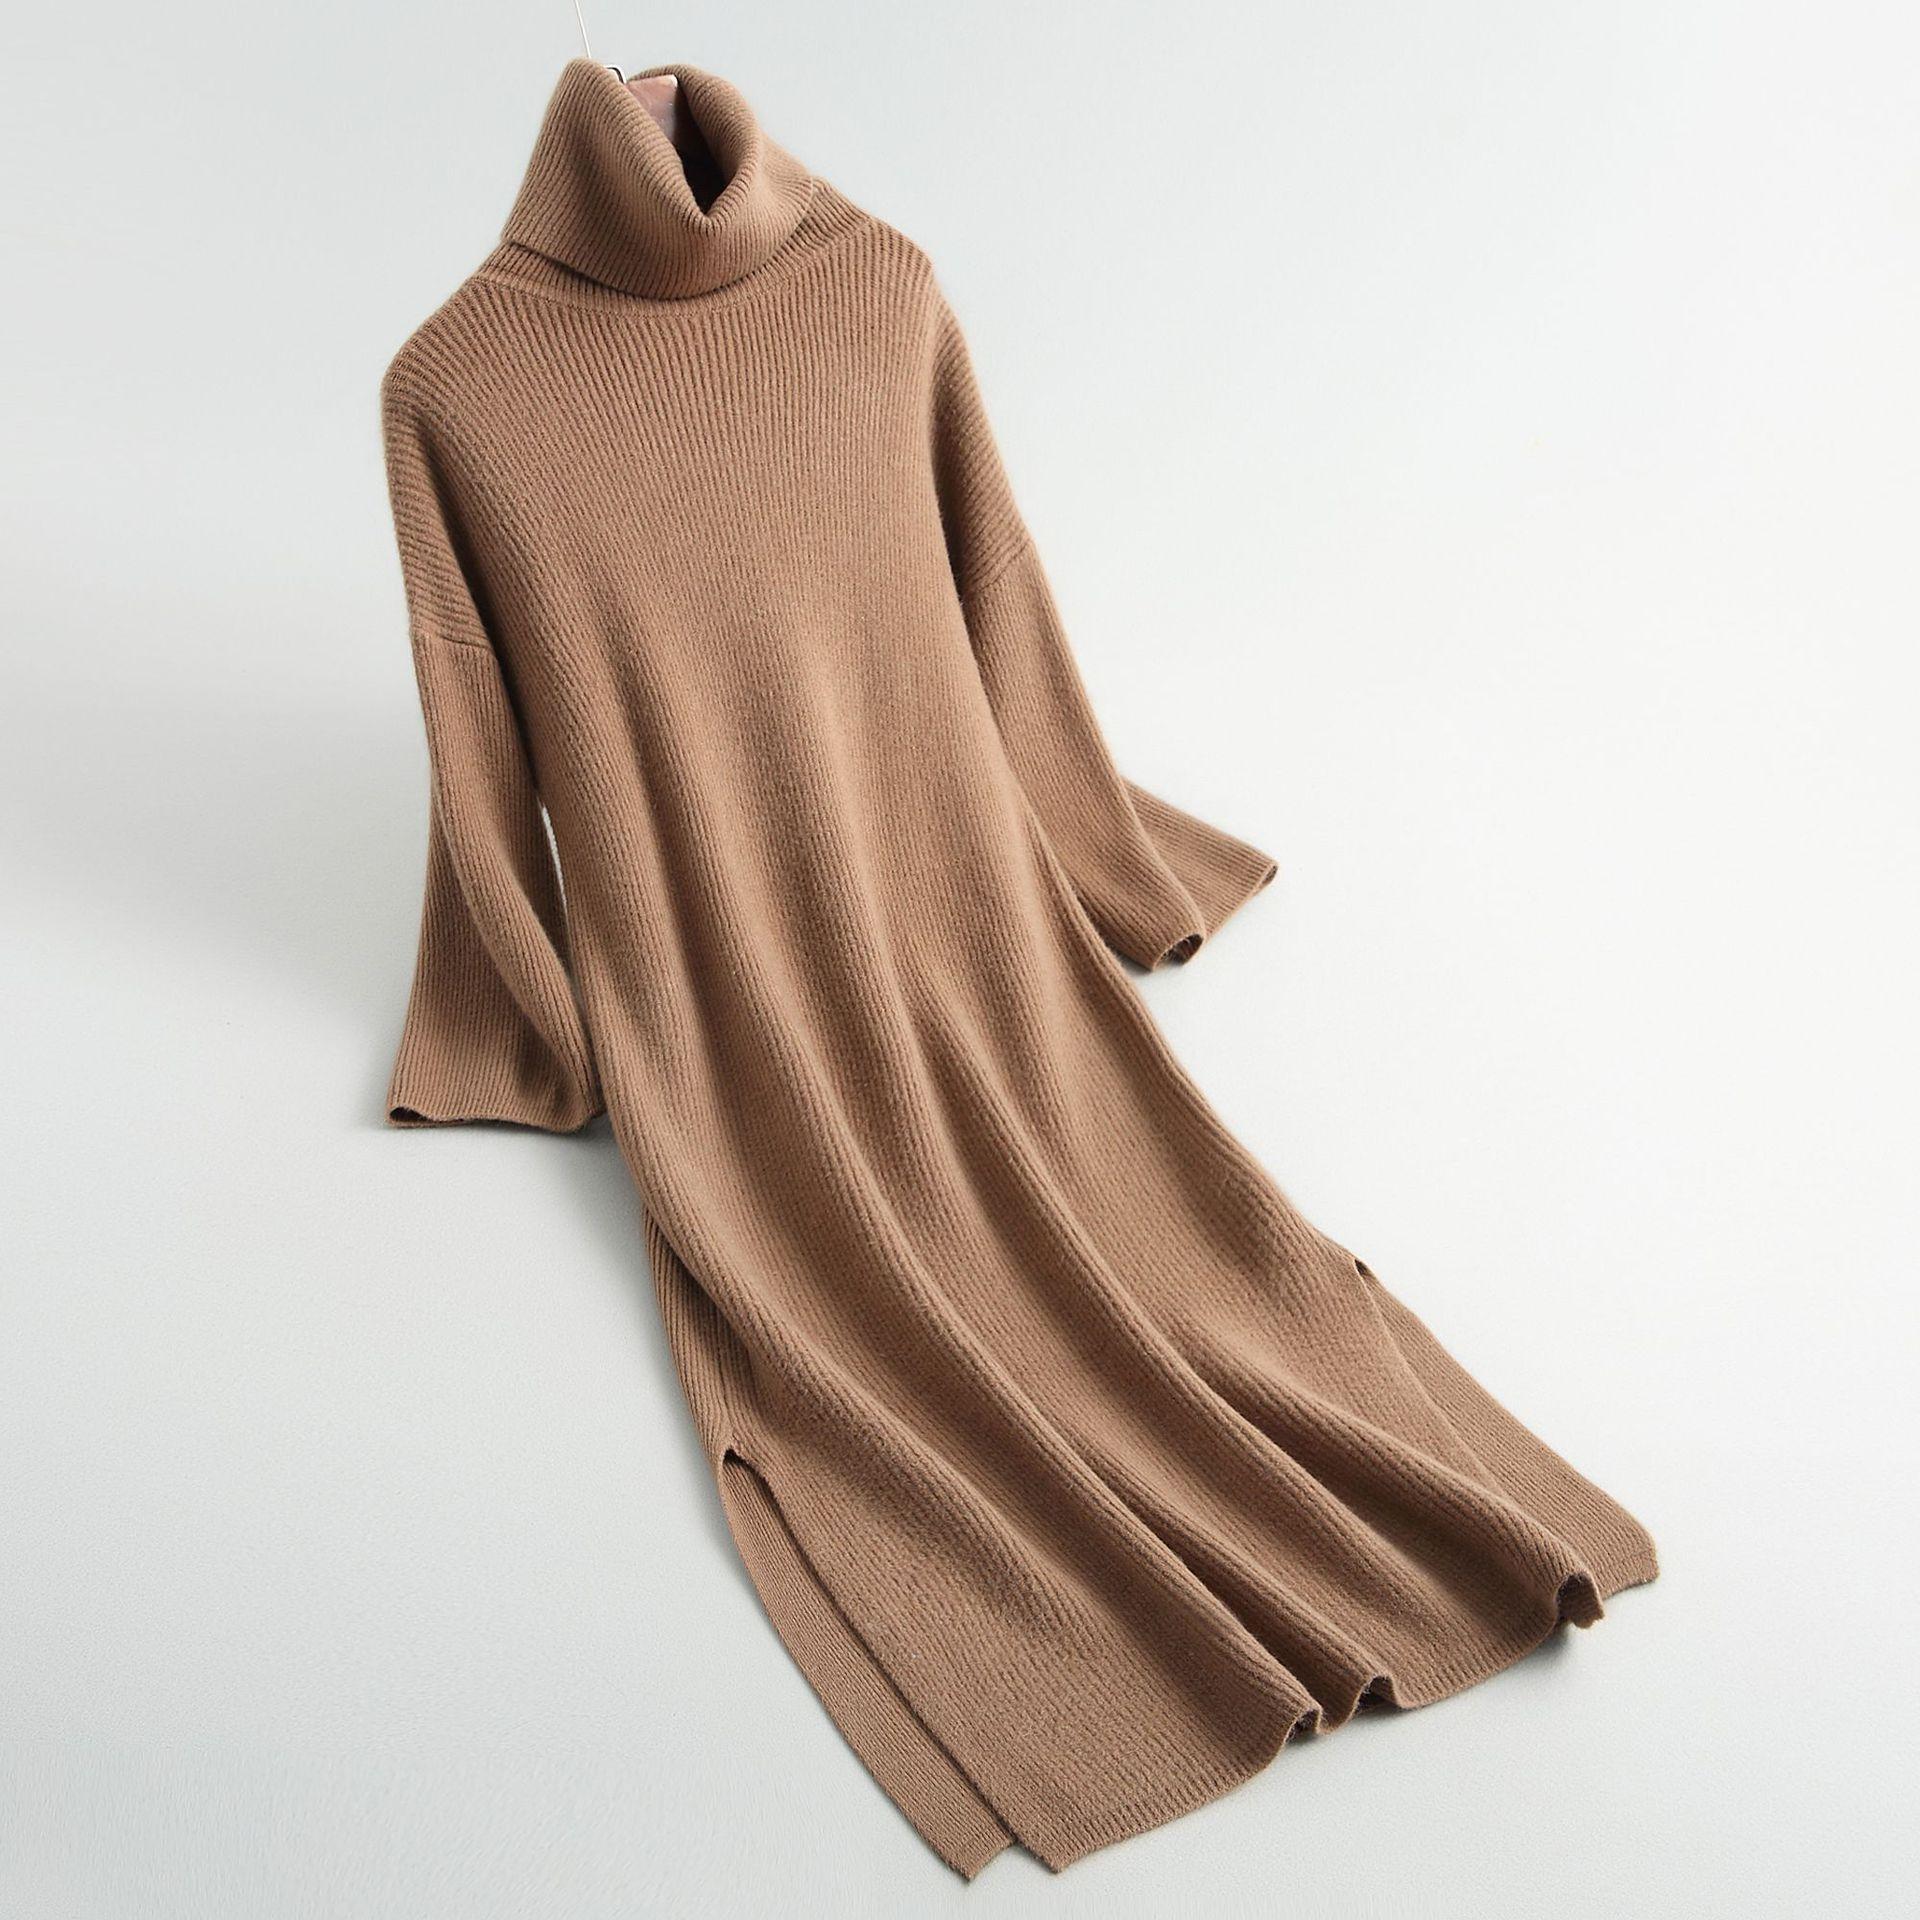 2018 femmes Pull à col roulé Split femmes moulante Pull robe longs pulls à tricoter femmes hiver Pull Femme Tricot Pull